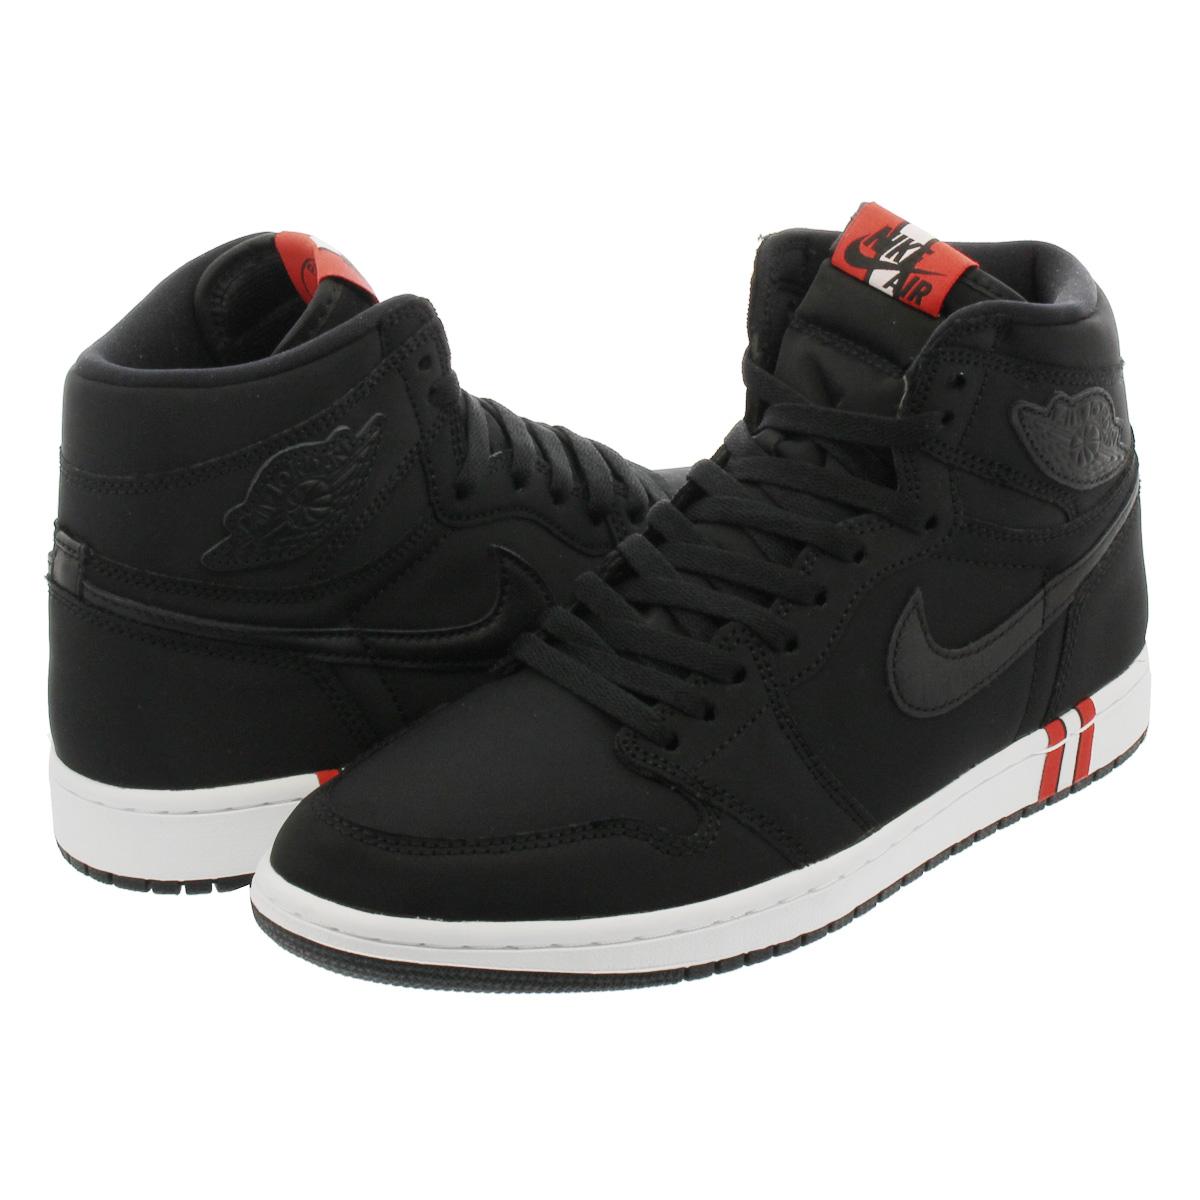 best sneakers 72c3c cfdcd NIKE AIR JORDAN 1 RETRO HIGH OG BCFC Nike Air Jordan 1 nostalgic high OG  BLACK WHITE CHALLENGE RED ar3254-001